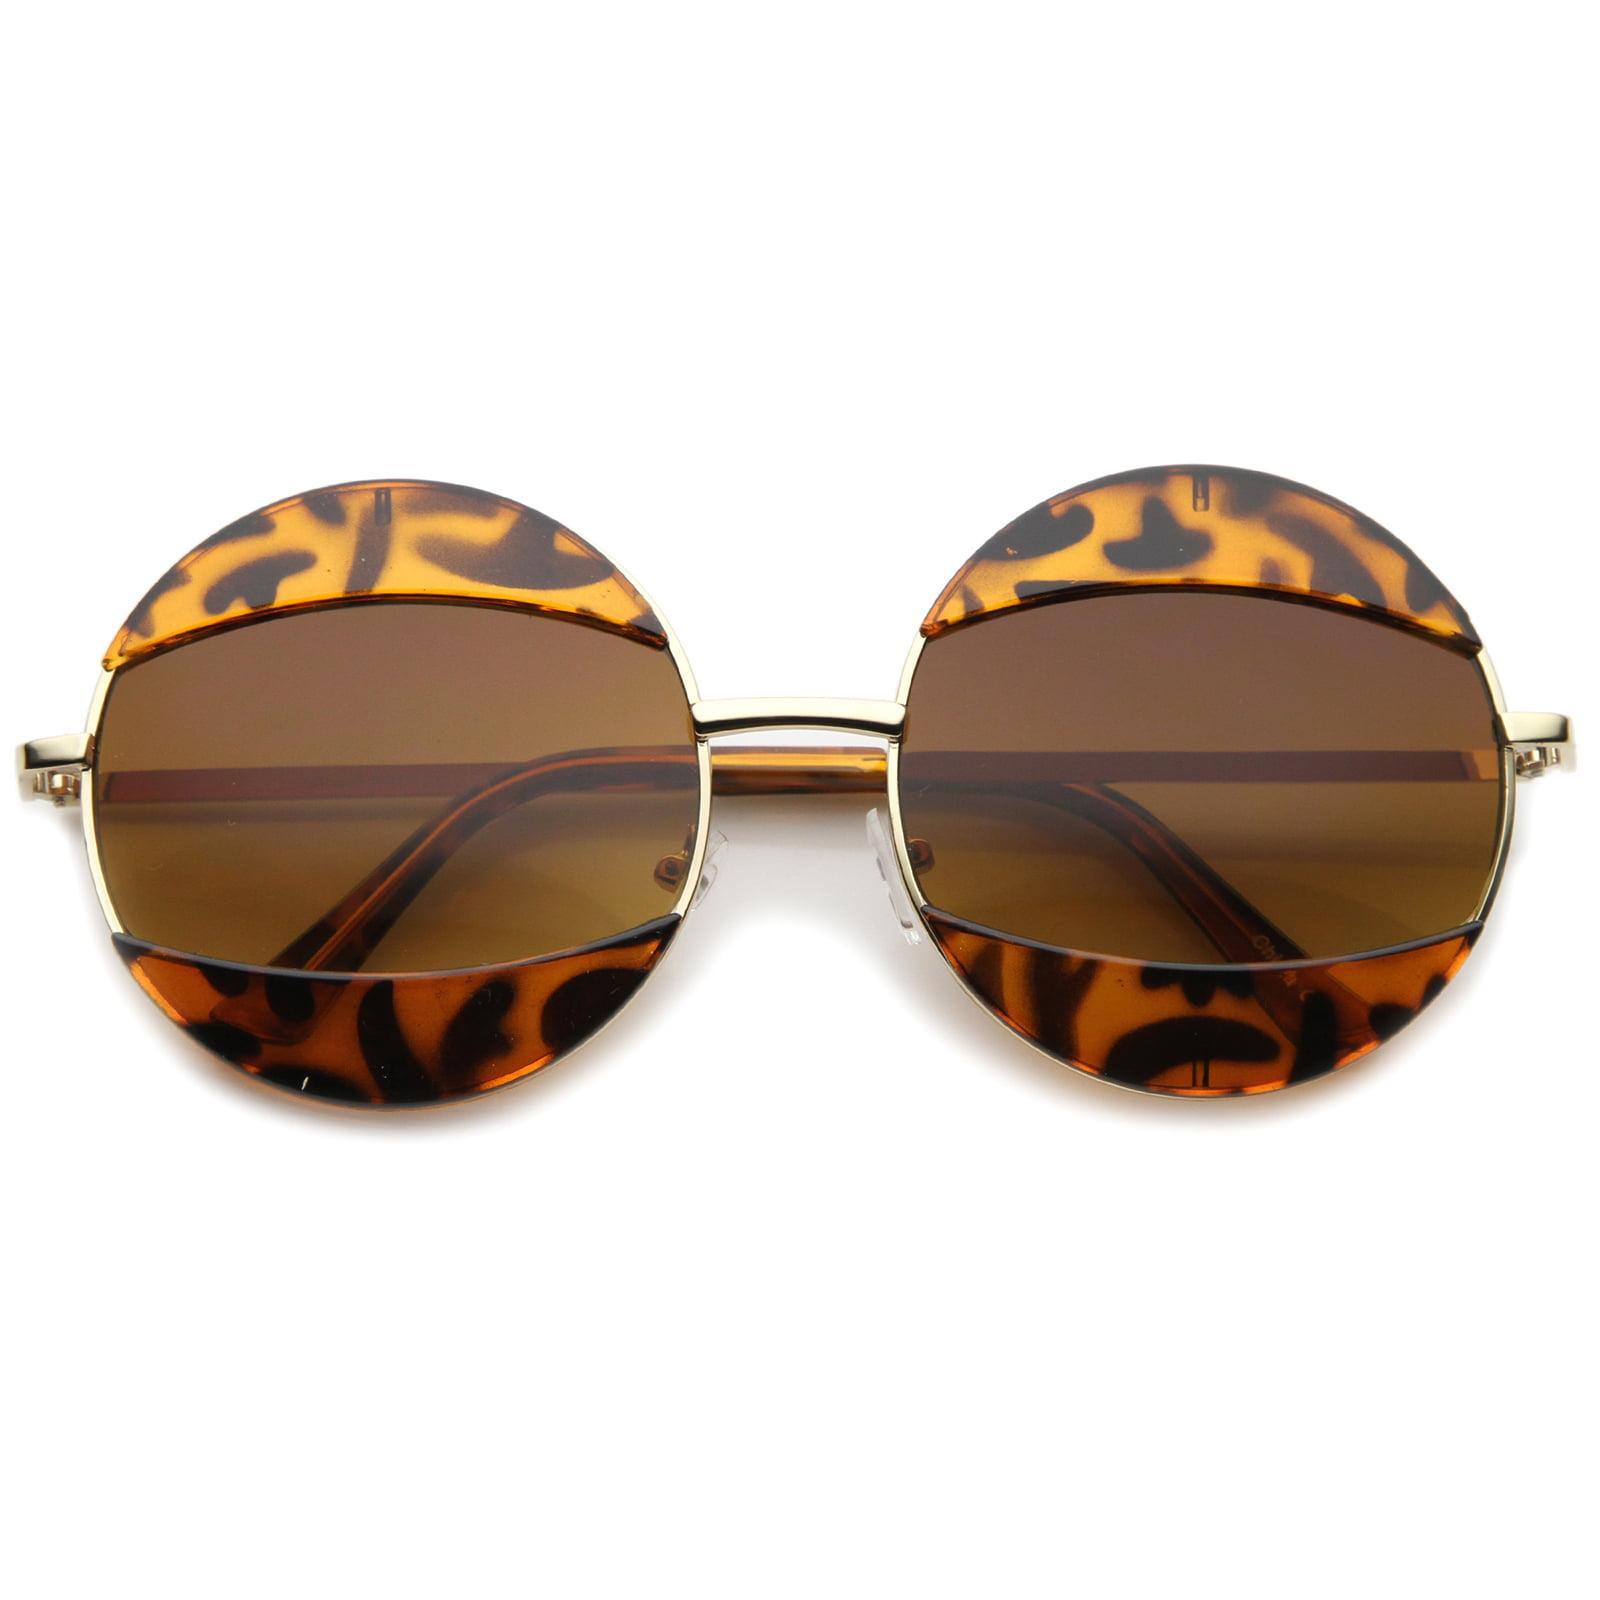 sunglassLA - Women's High Fashion Eyelid Metal Frame Oversize Round Sunglasses - 58mm